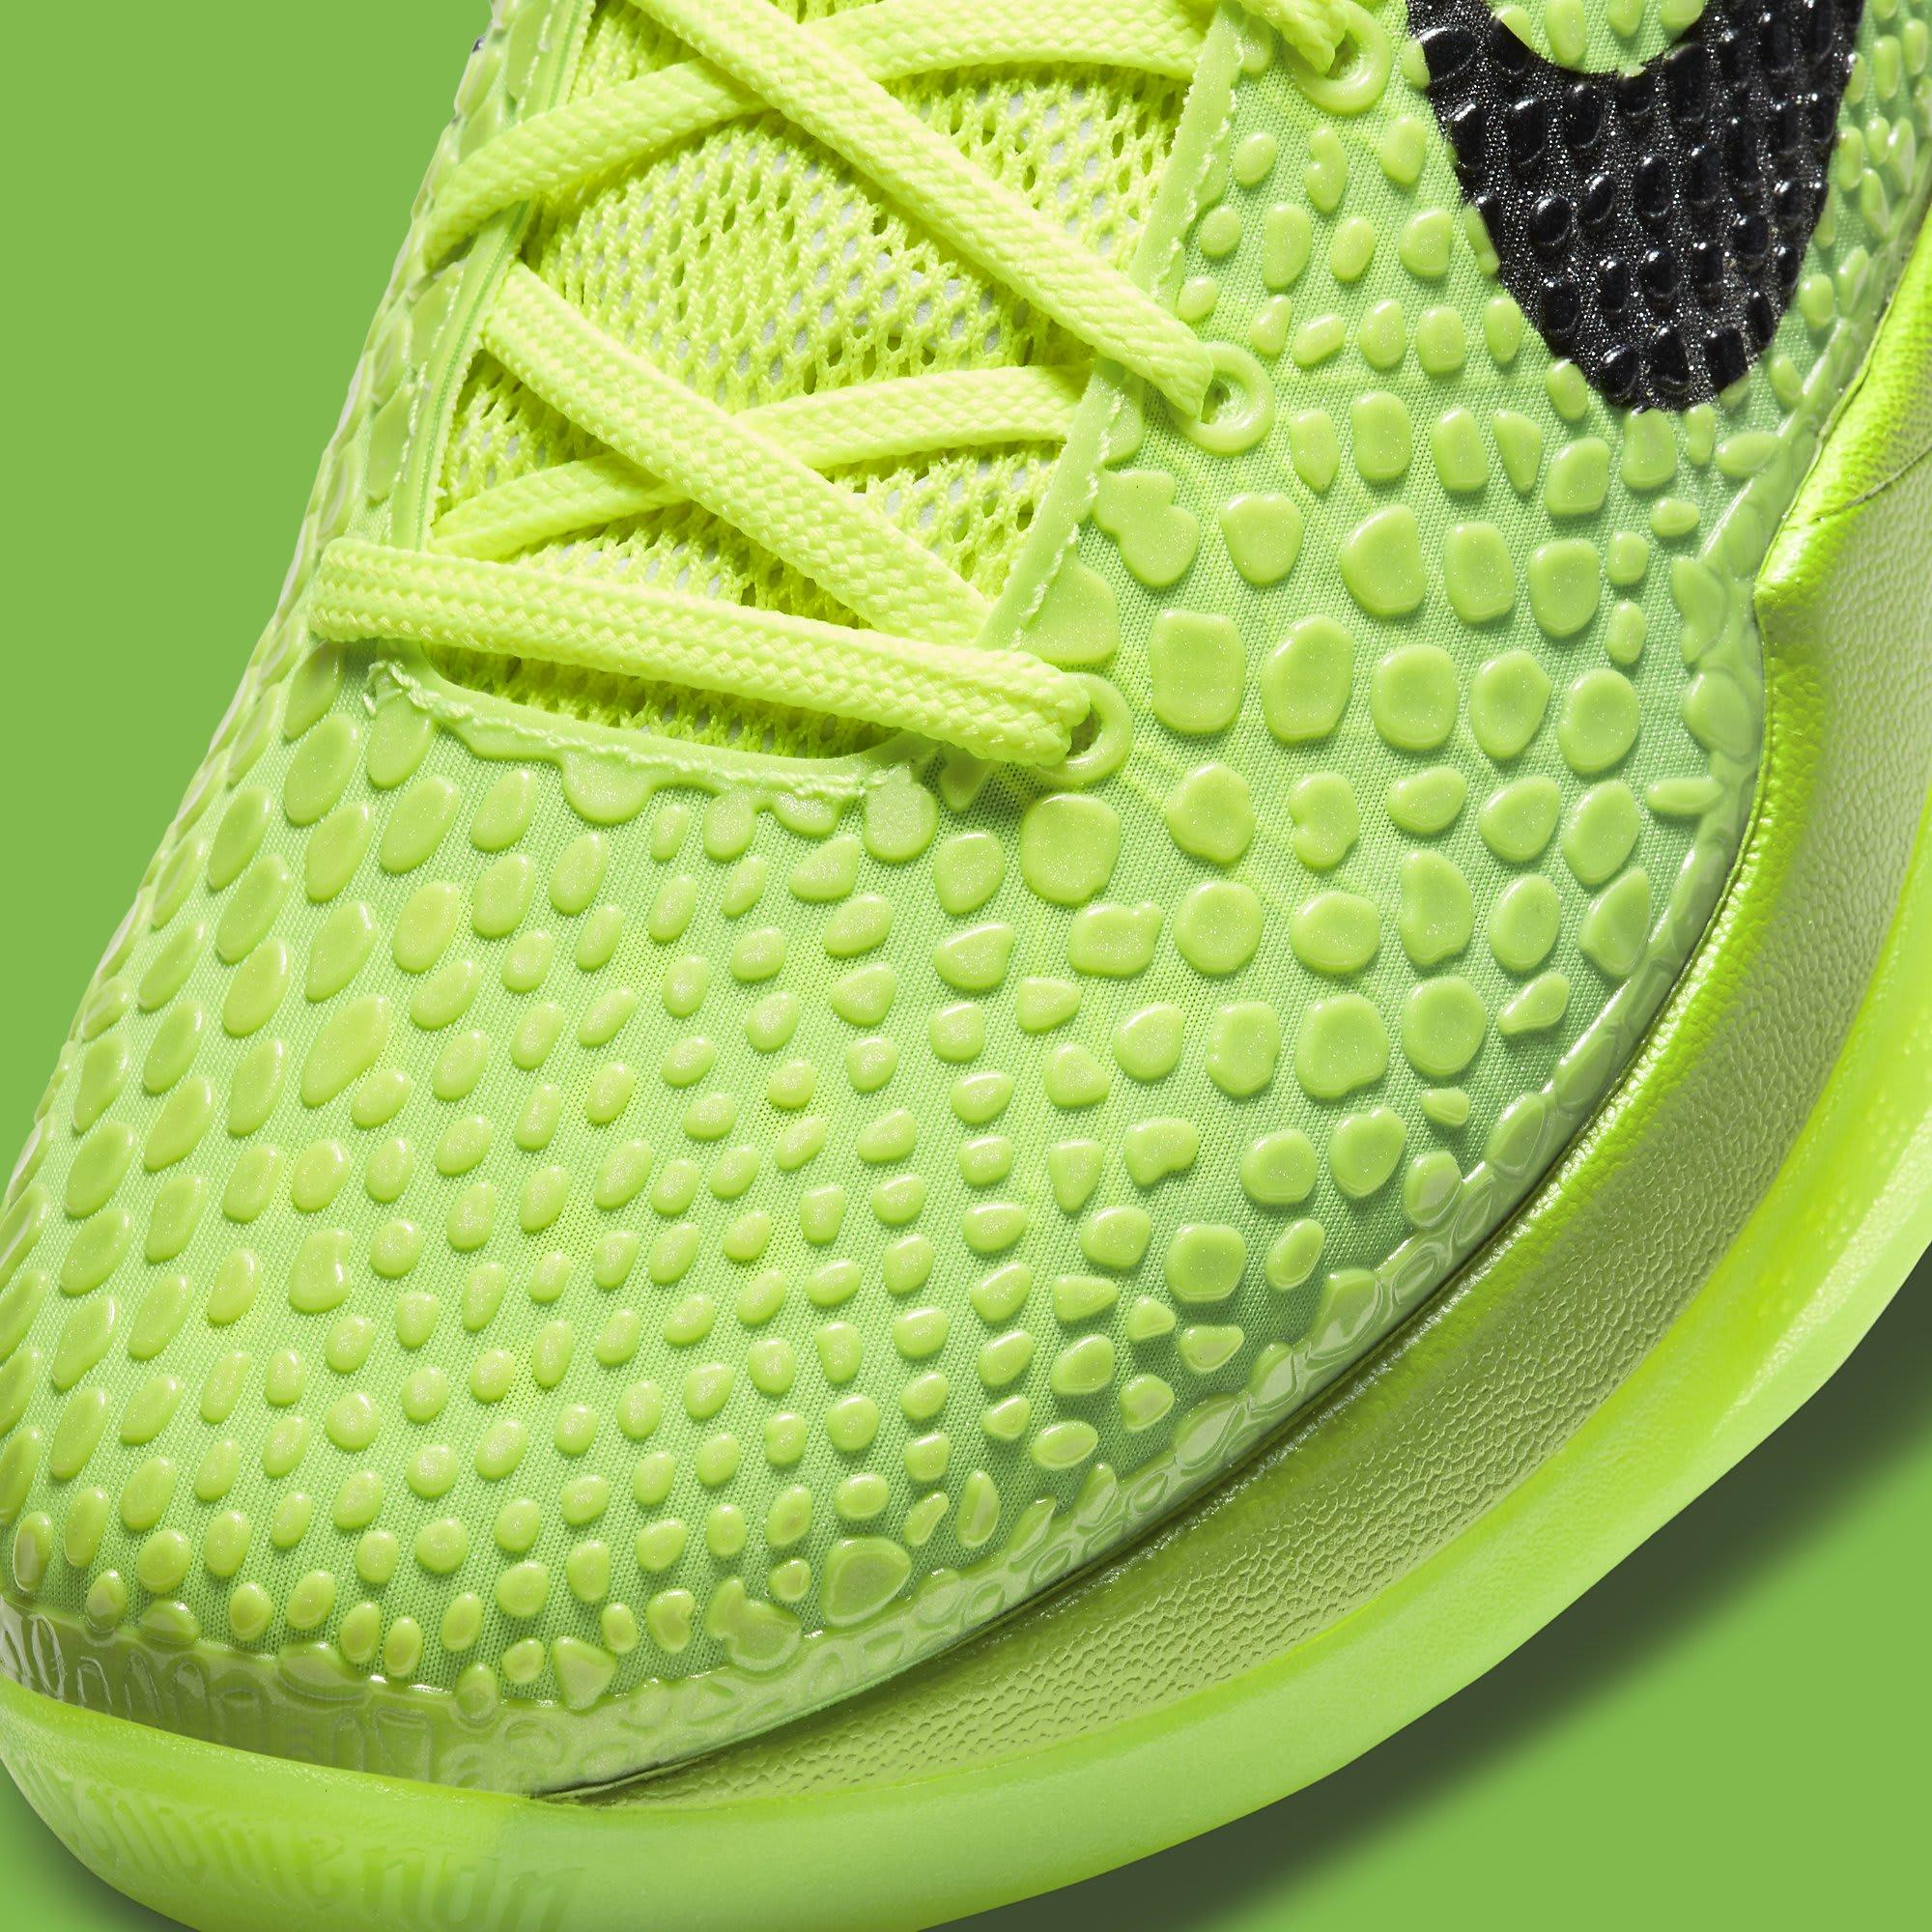 Nike Kobe 6 Protro 'Grinch' CW2190-300 Toe